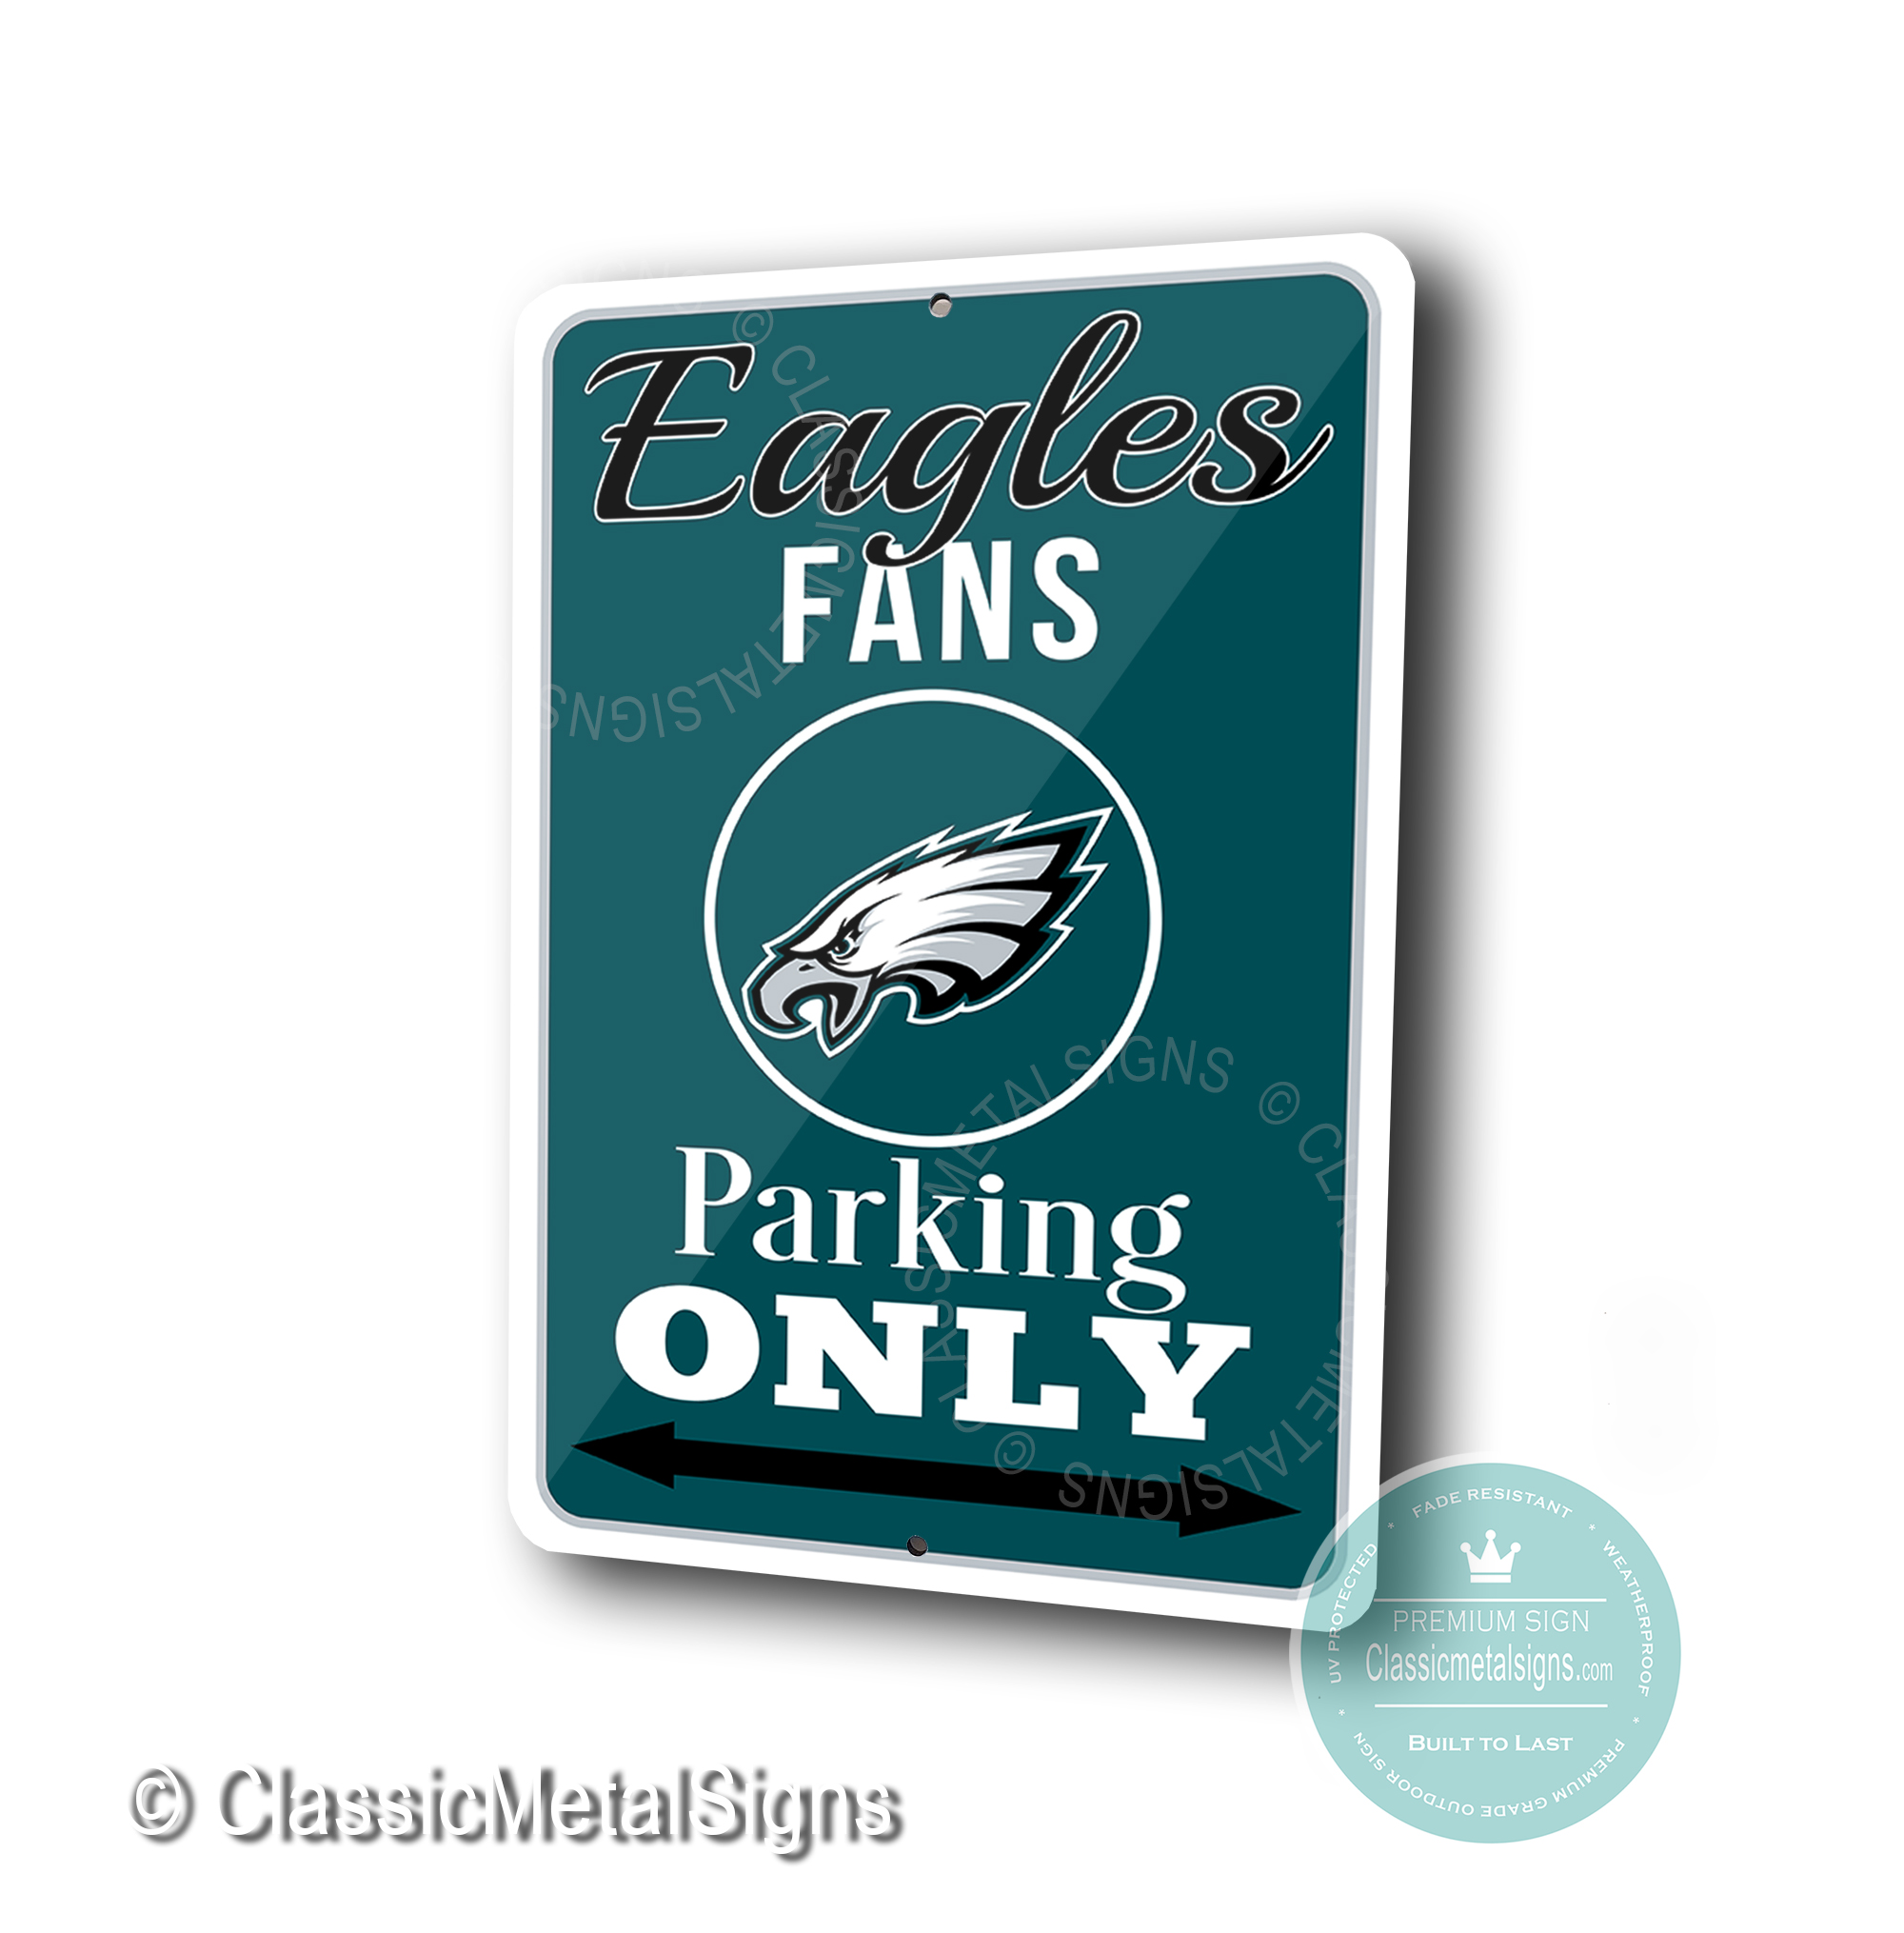 Philadelphia Eagles Parking Only Signs